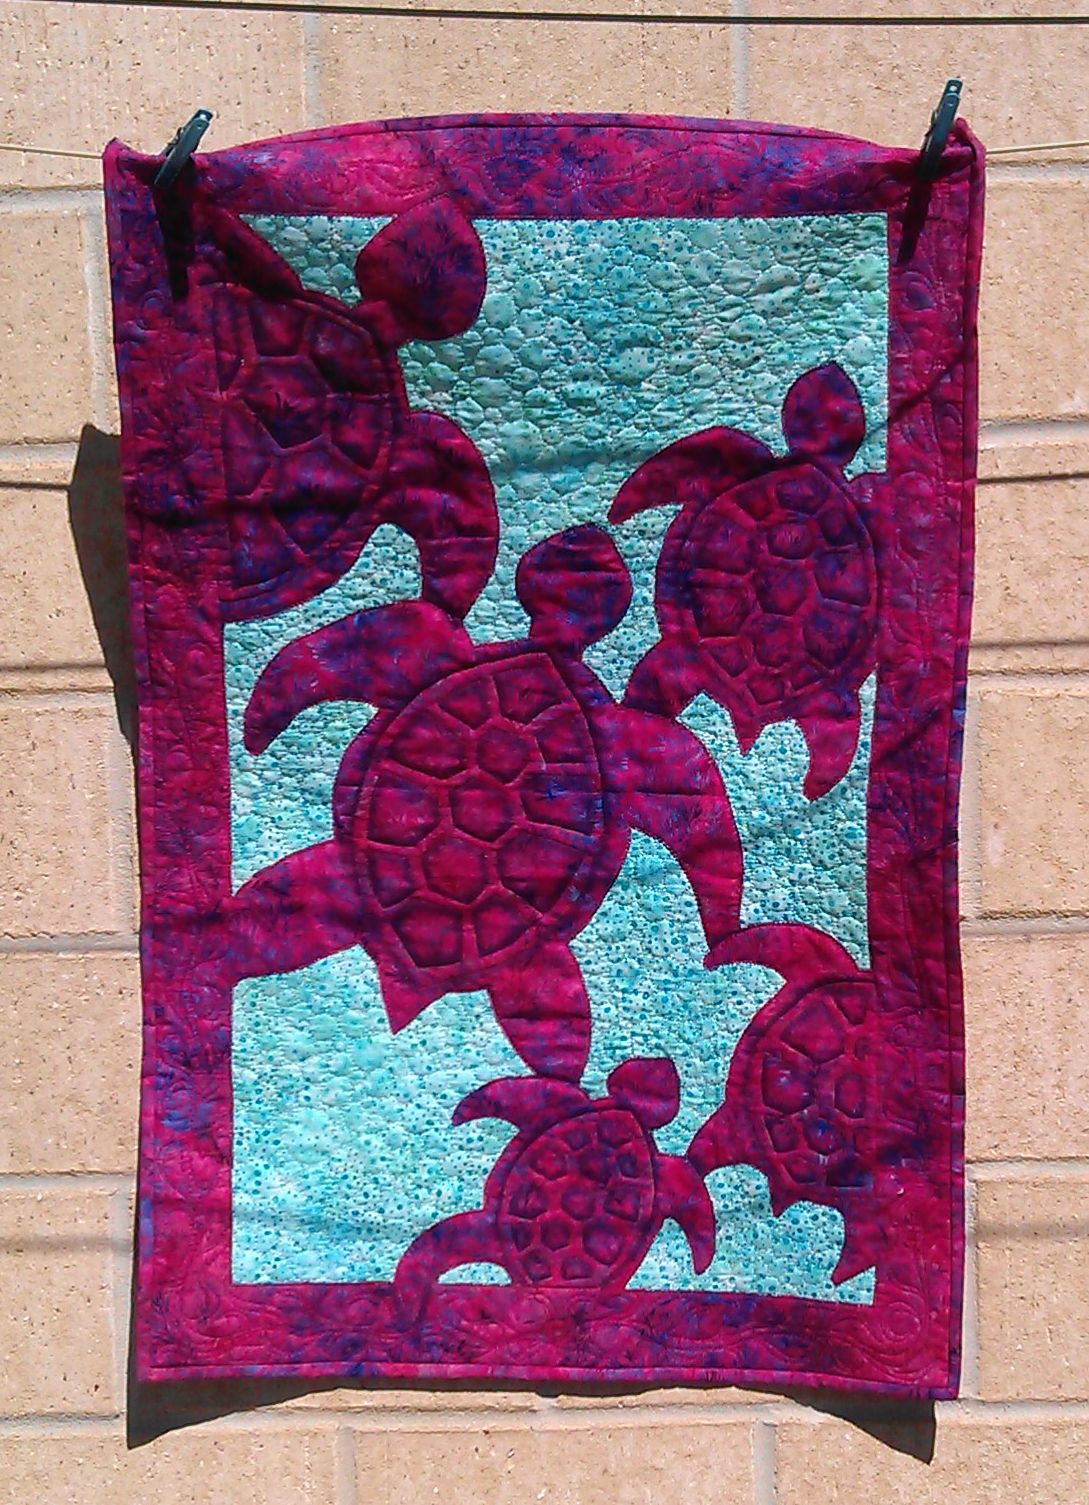 Quilt Patterns With Turtles : Turtle Quilt 3 Rhonda Bracey: At Random